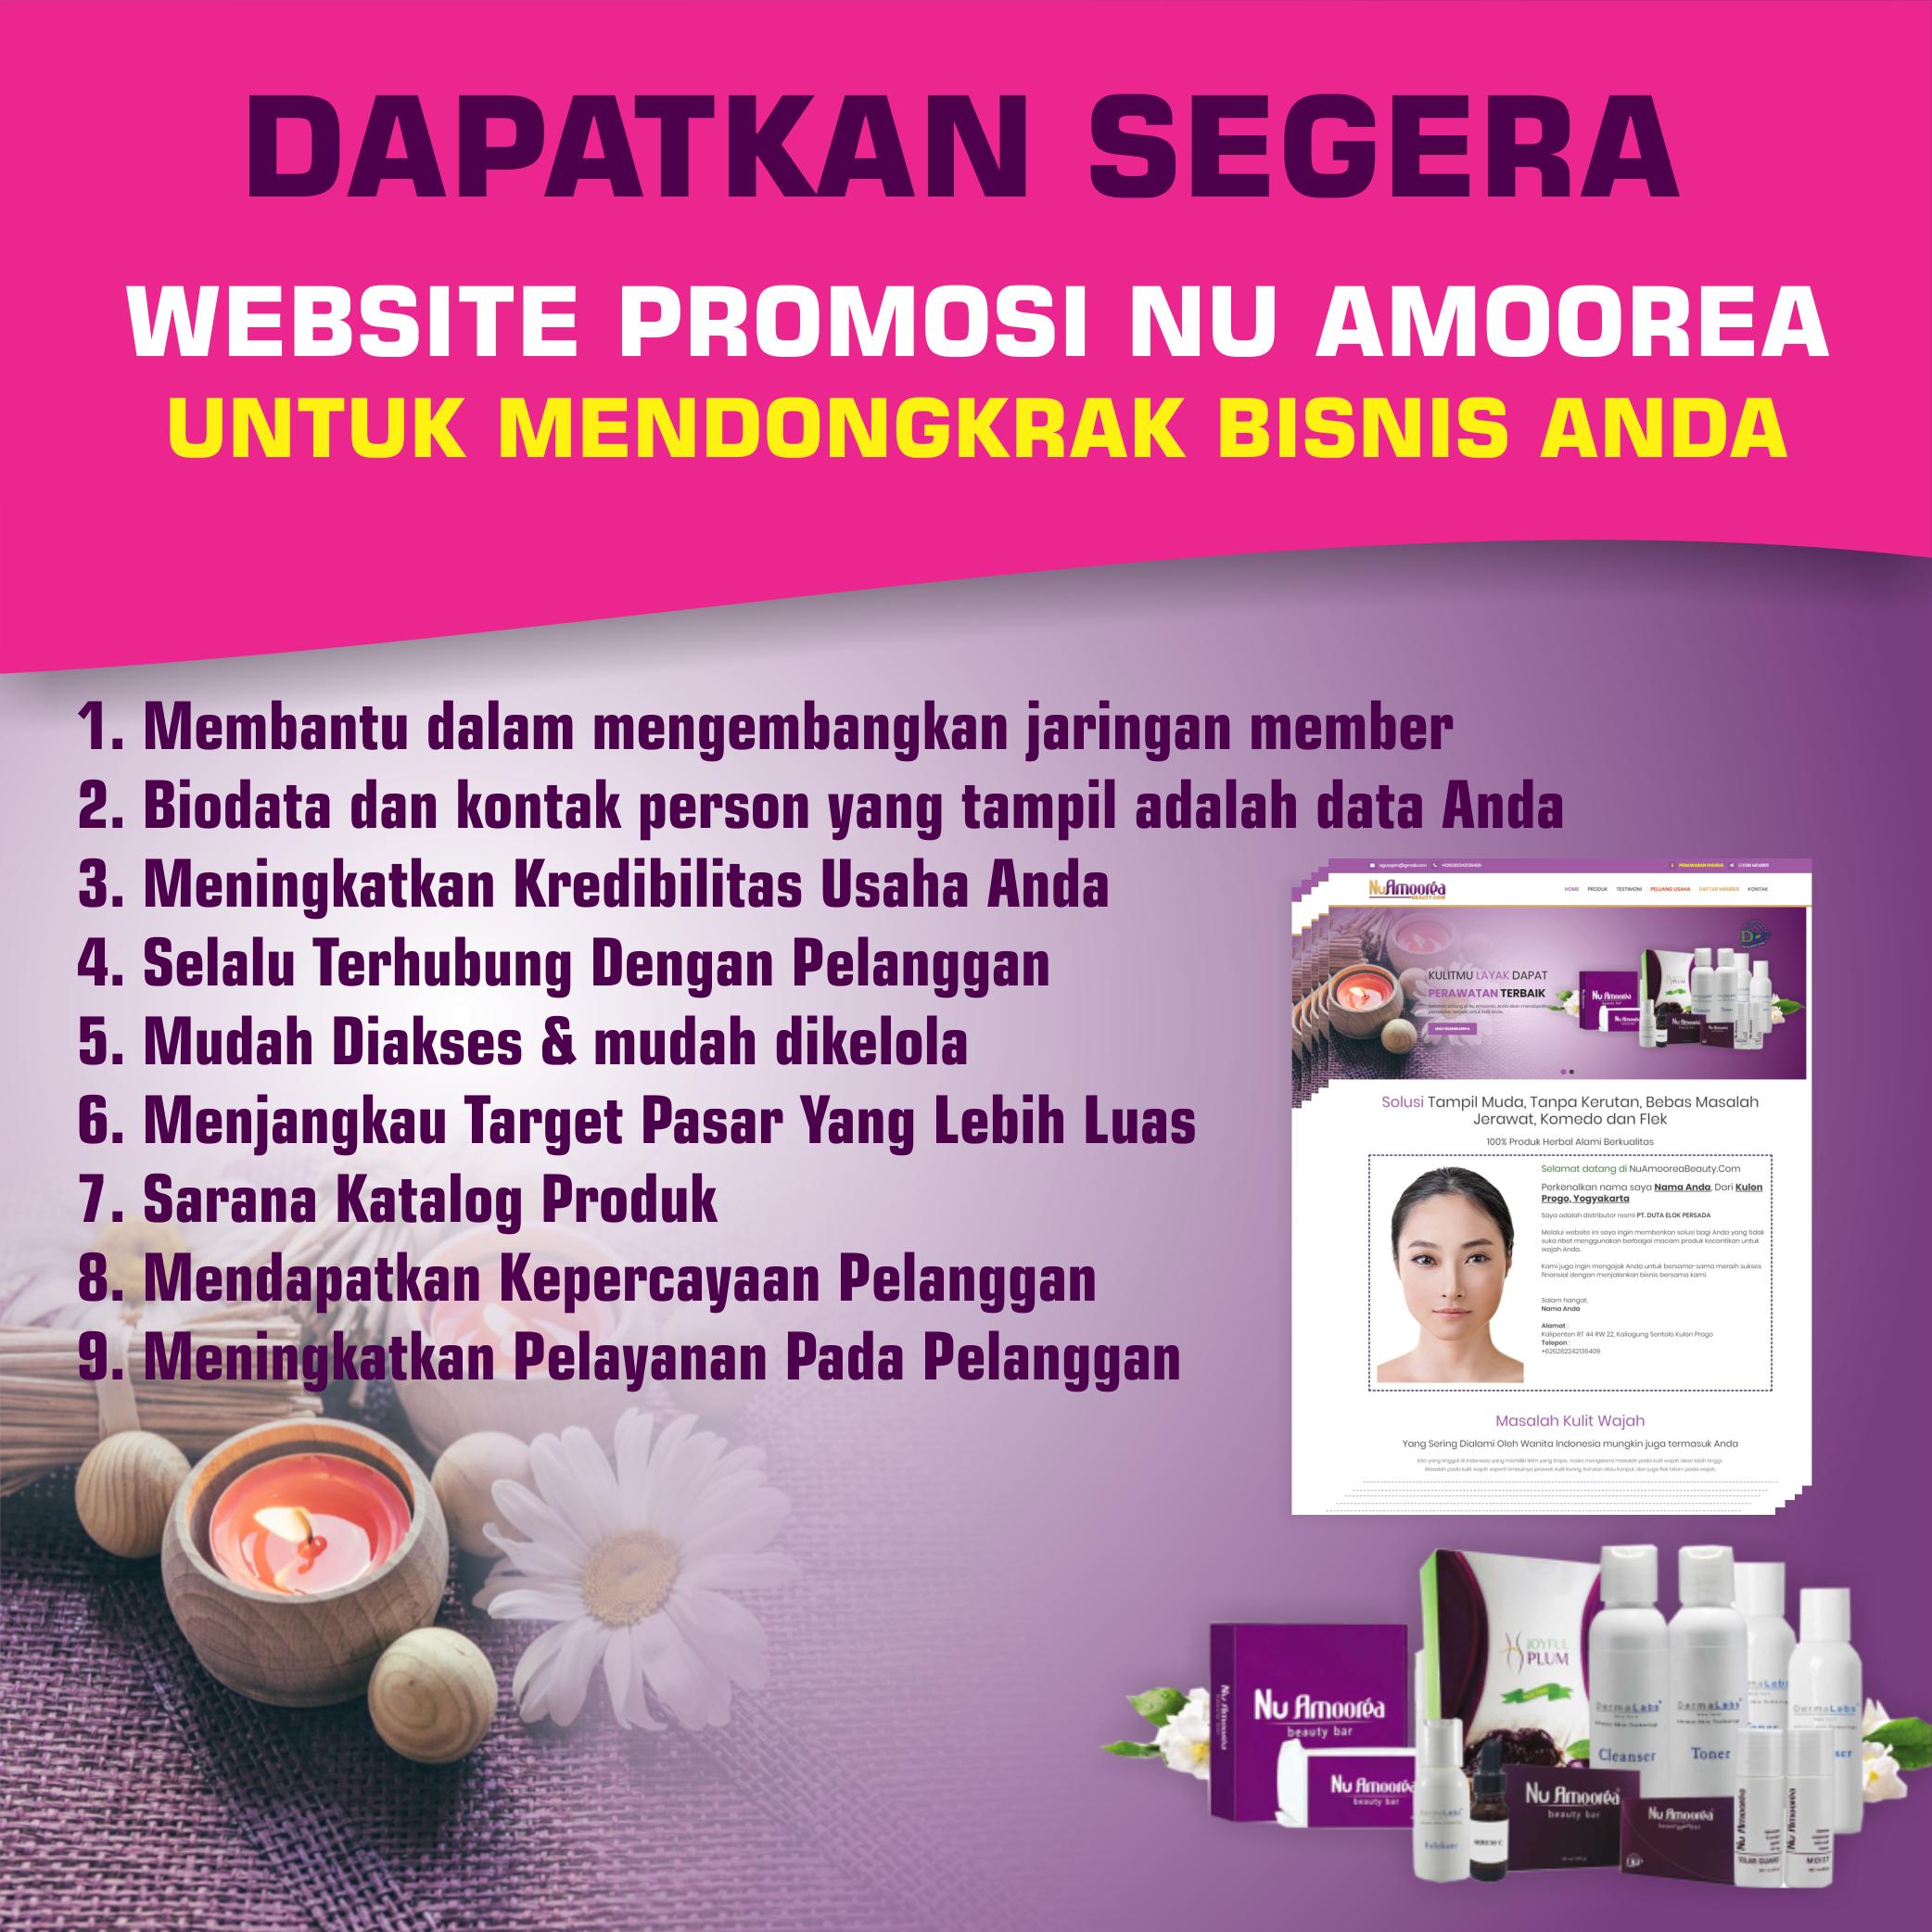 web-promosi-nu-amoorea